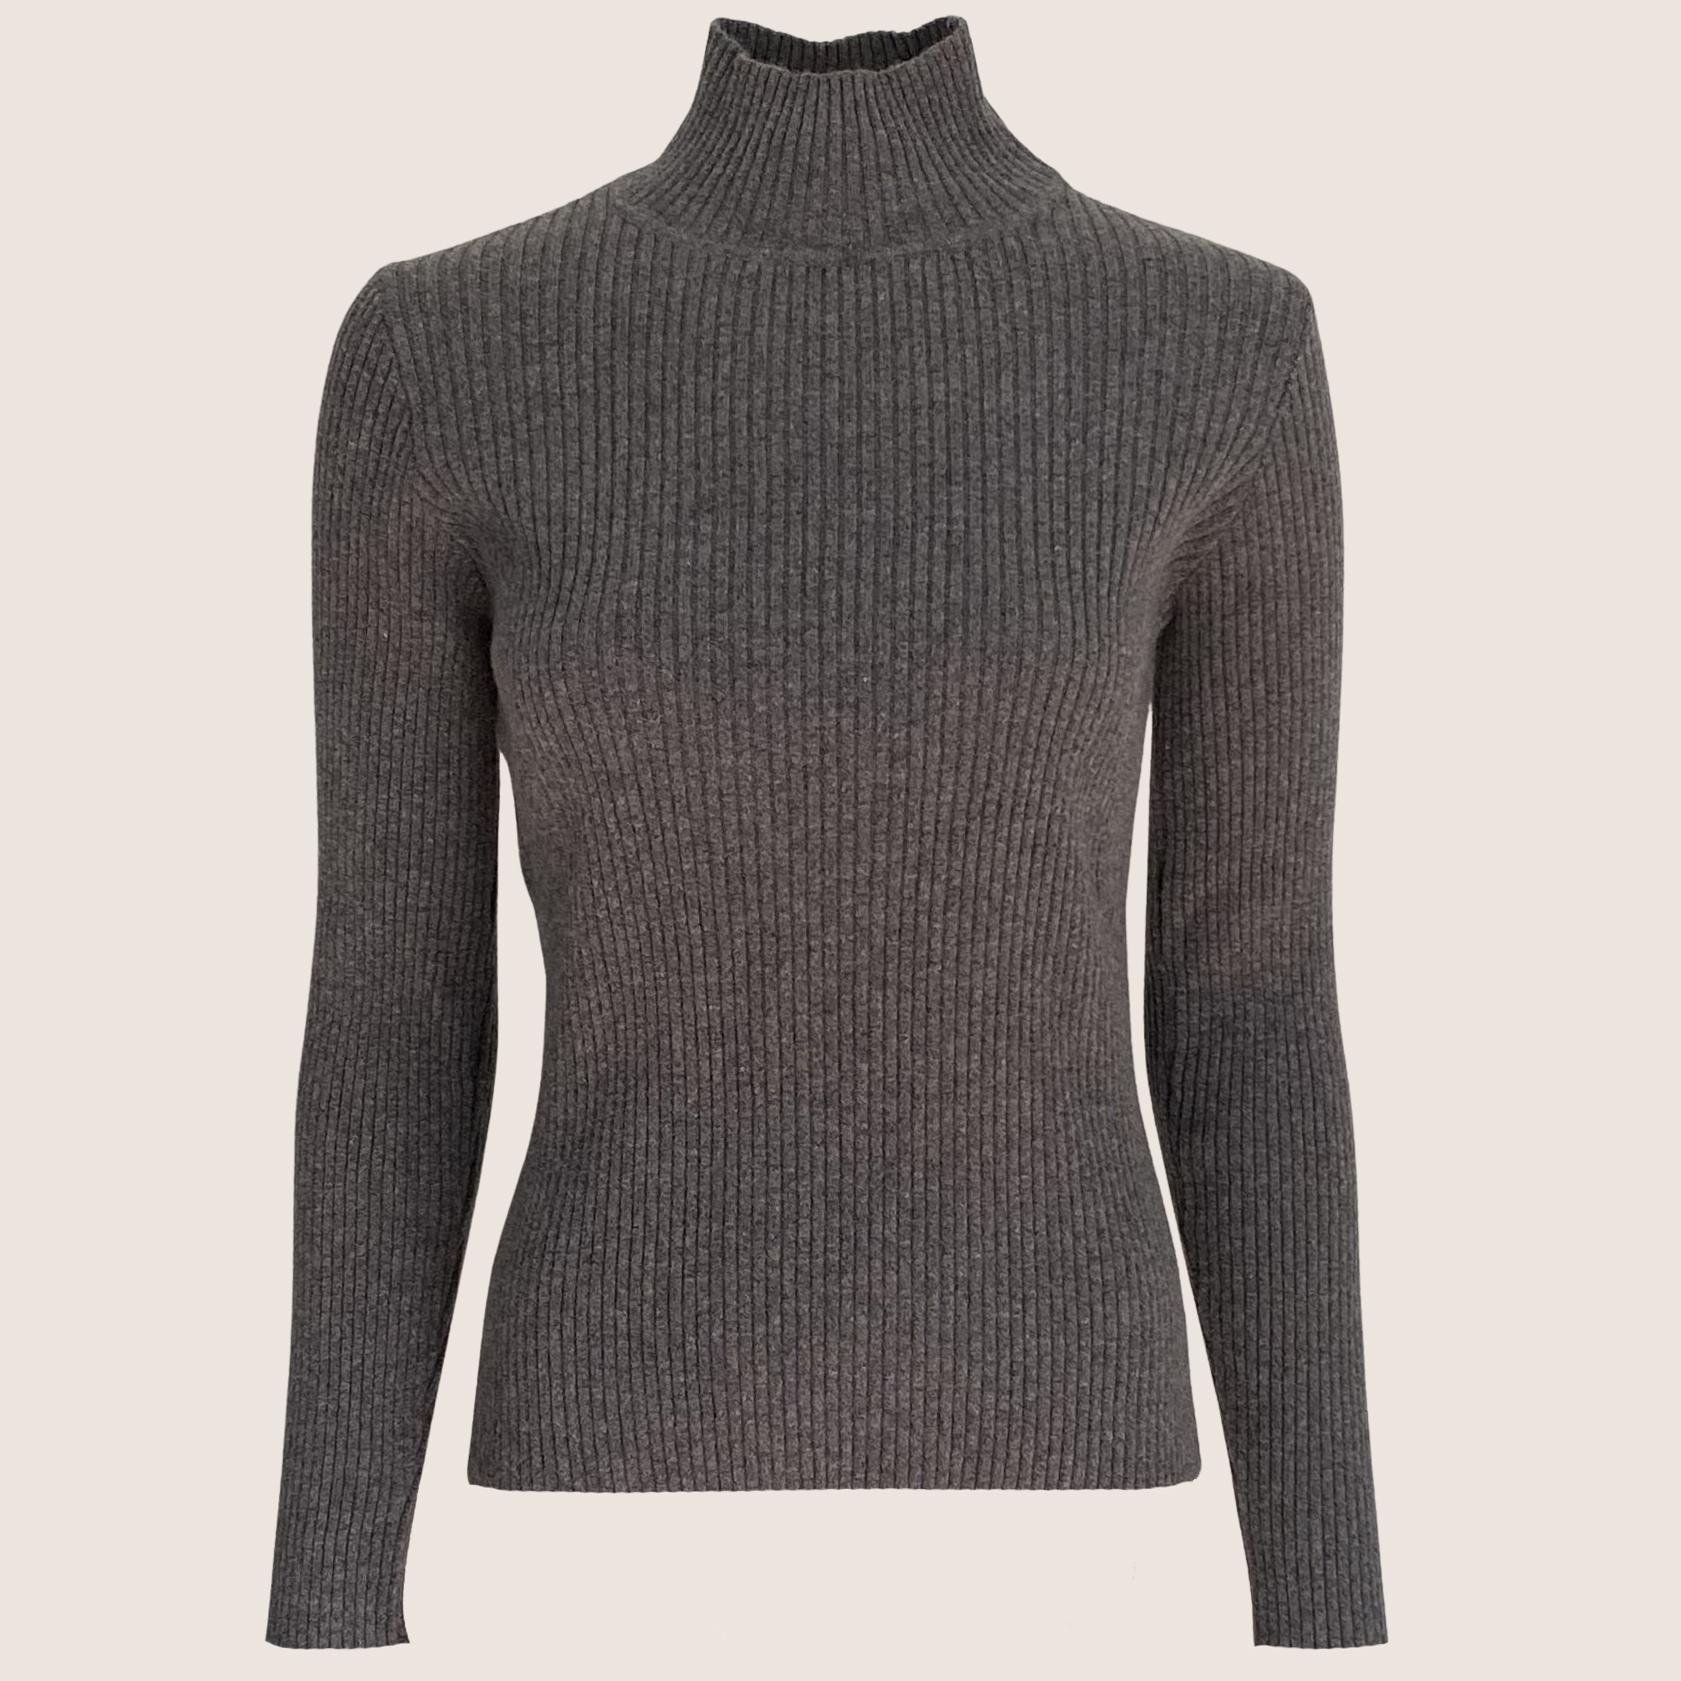 Rib Turtle Neck Sweater